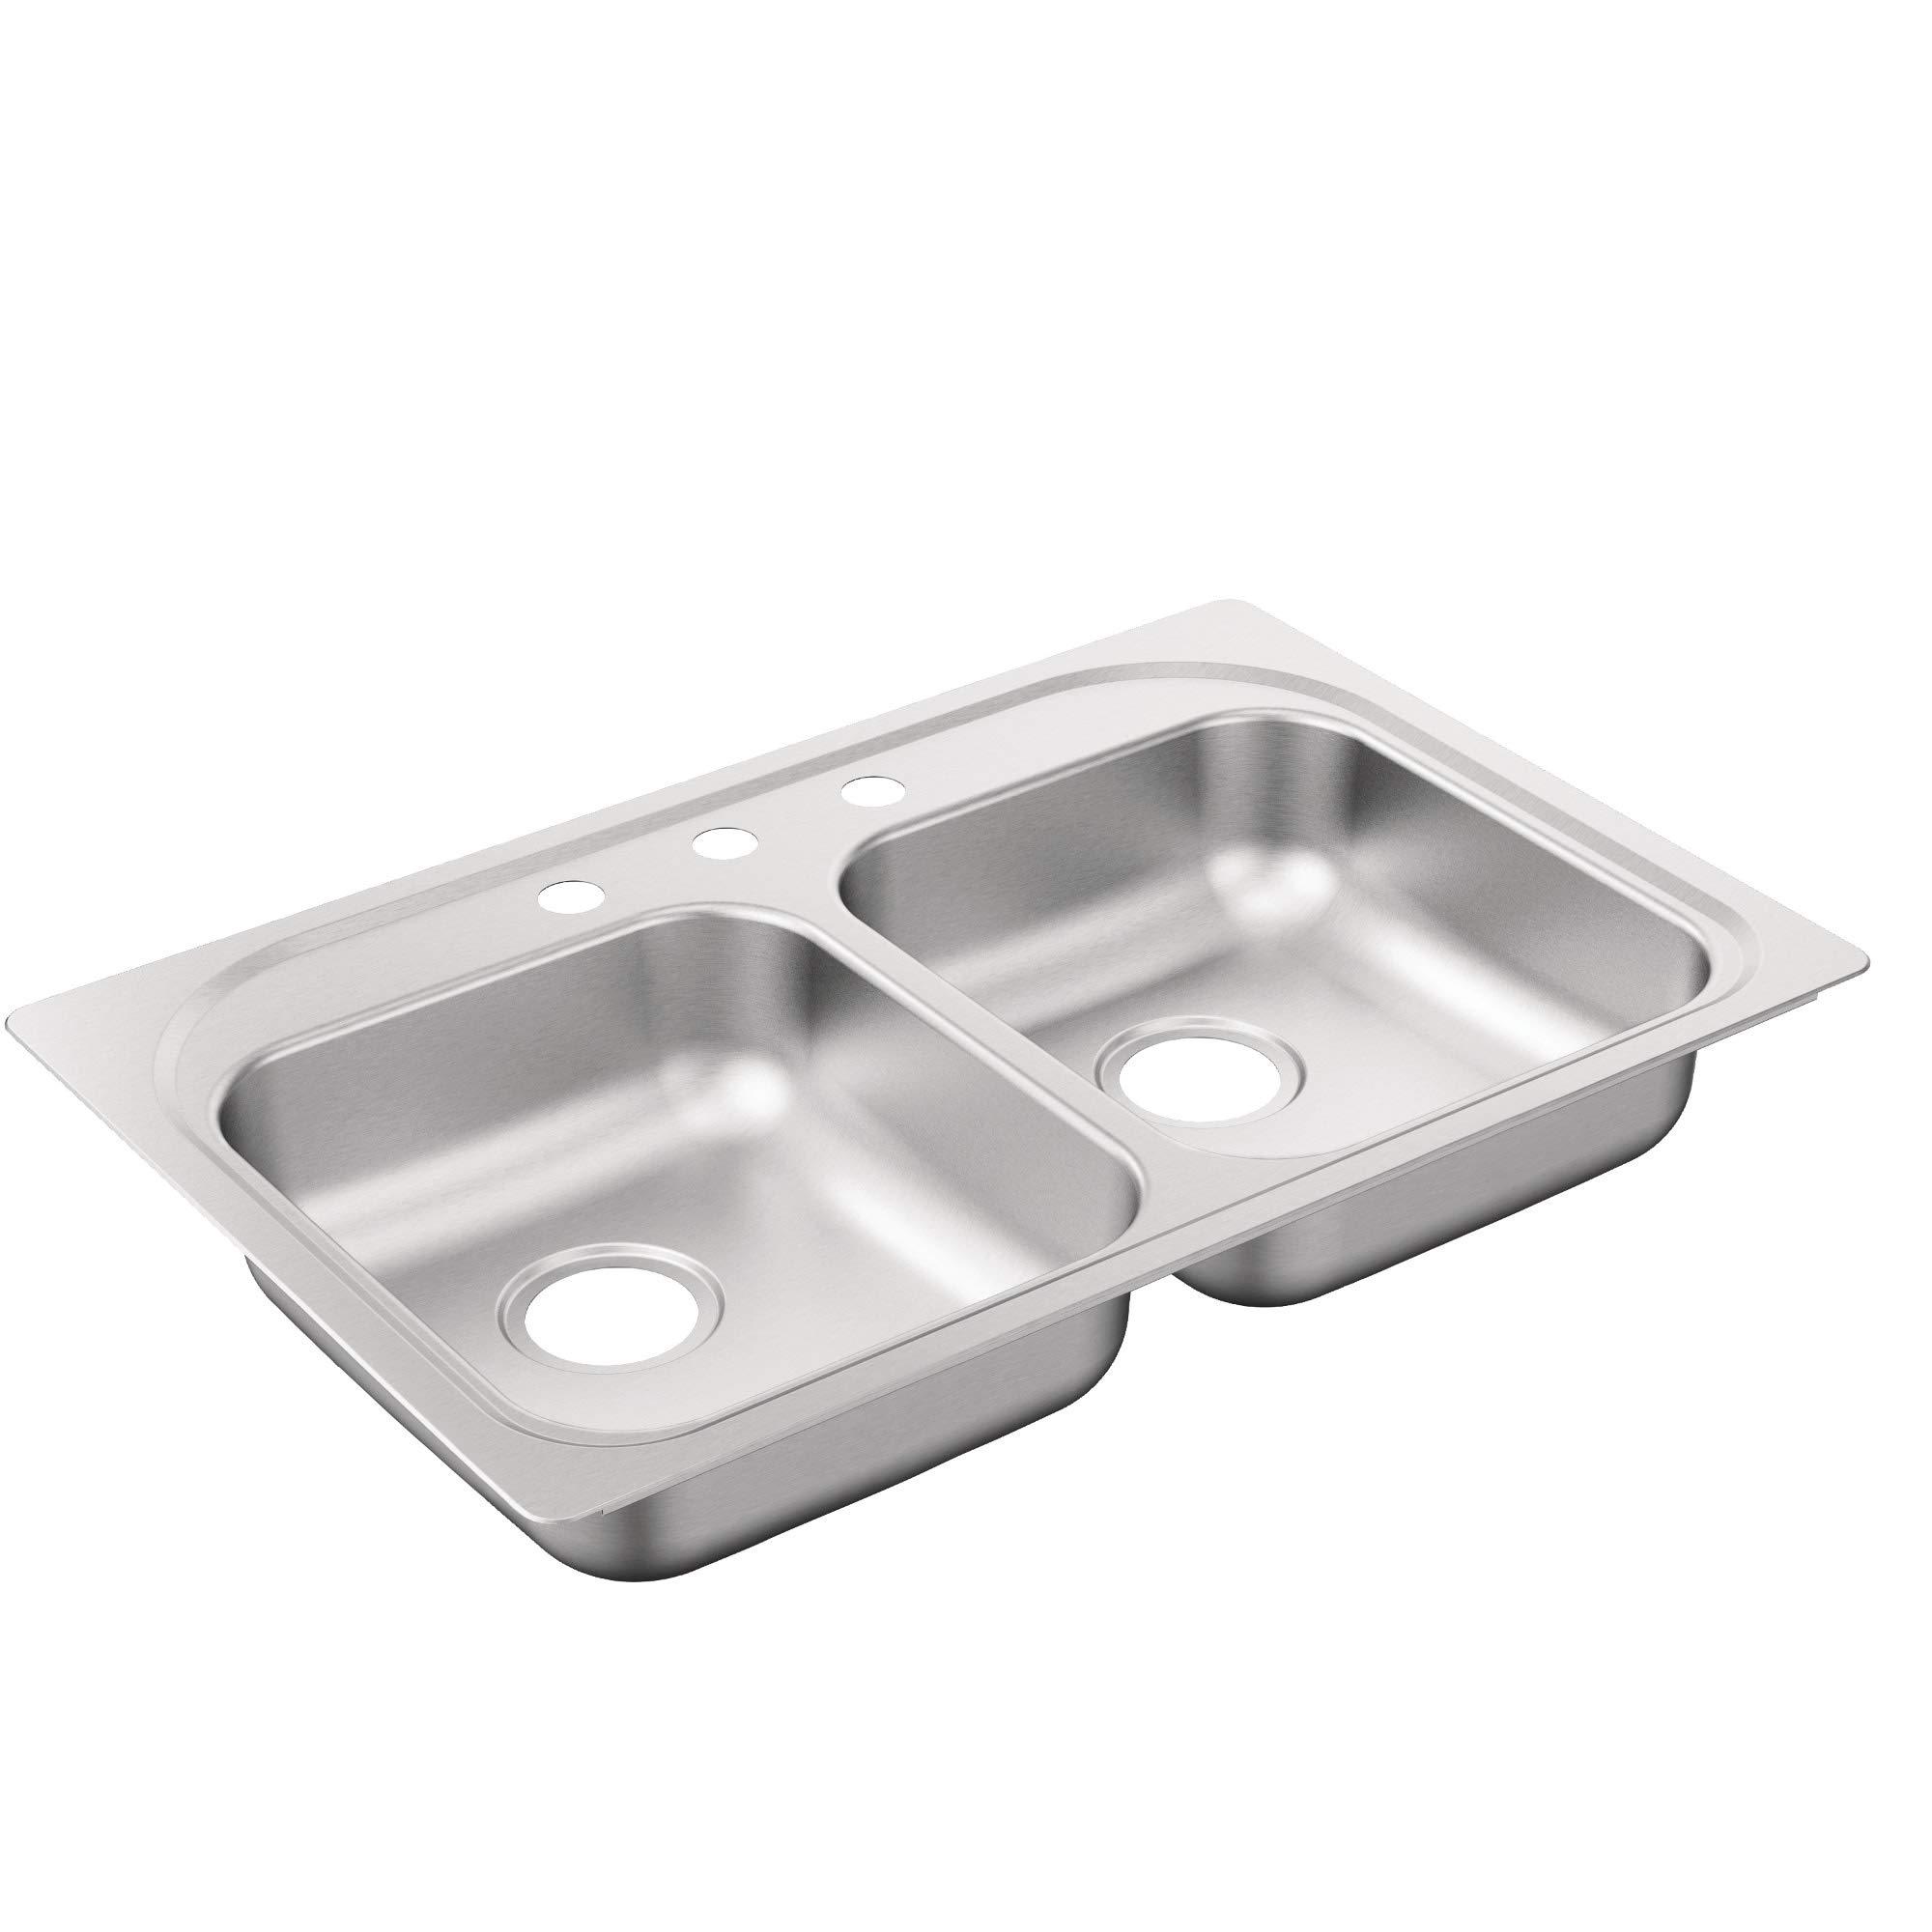 Moen G222203B 2200 Series Sink Brushed/Satin Stainless